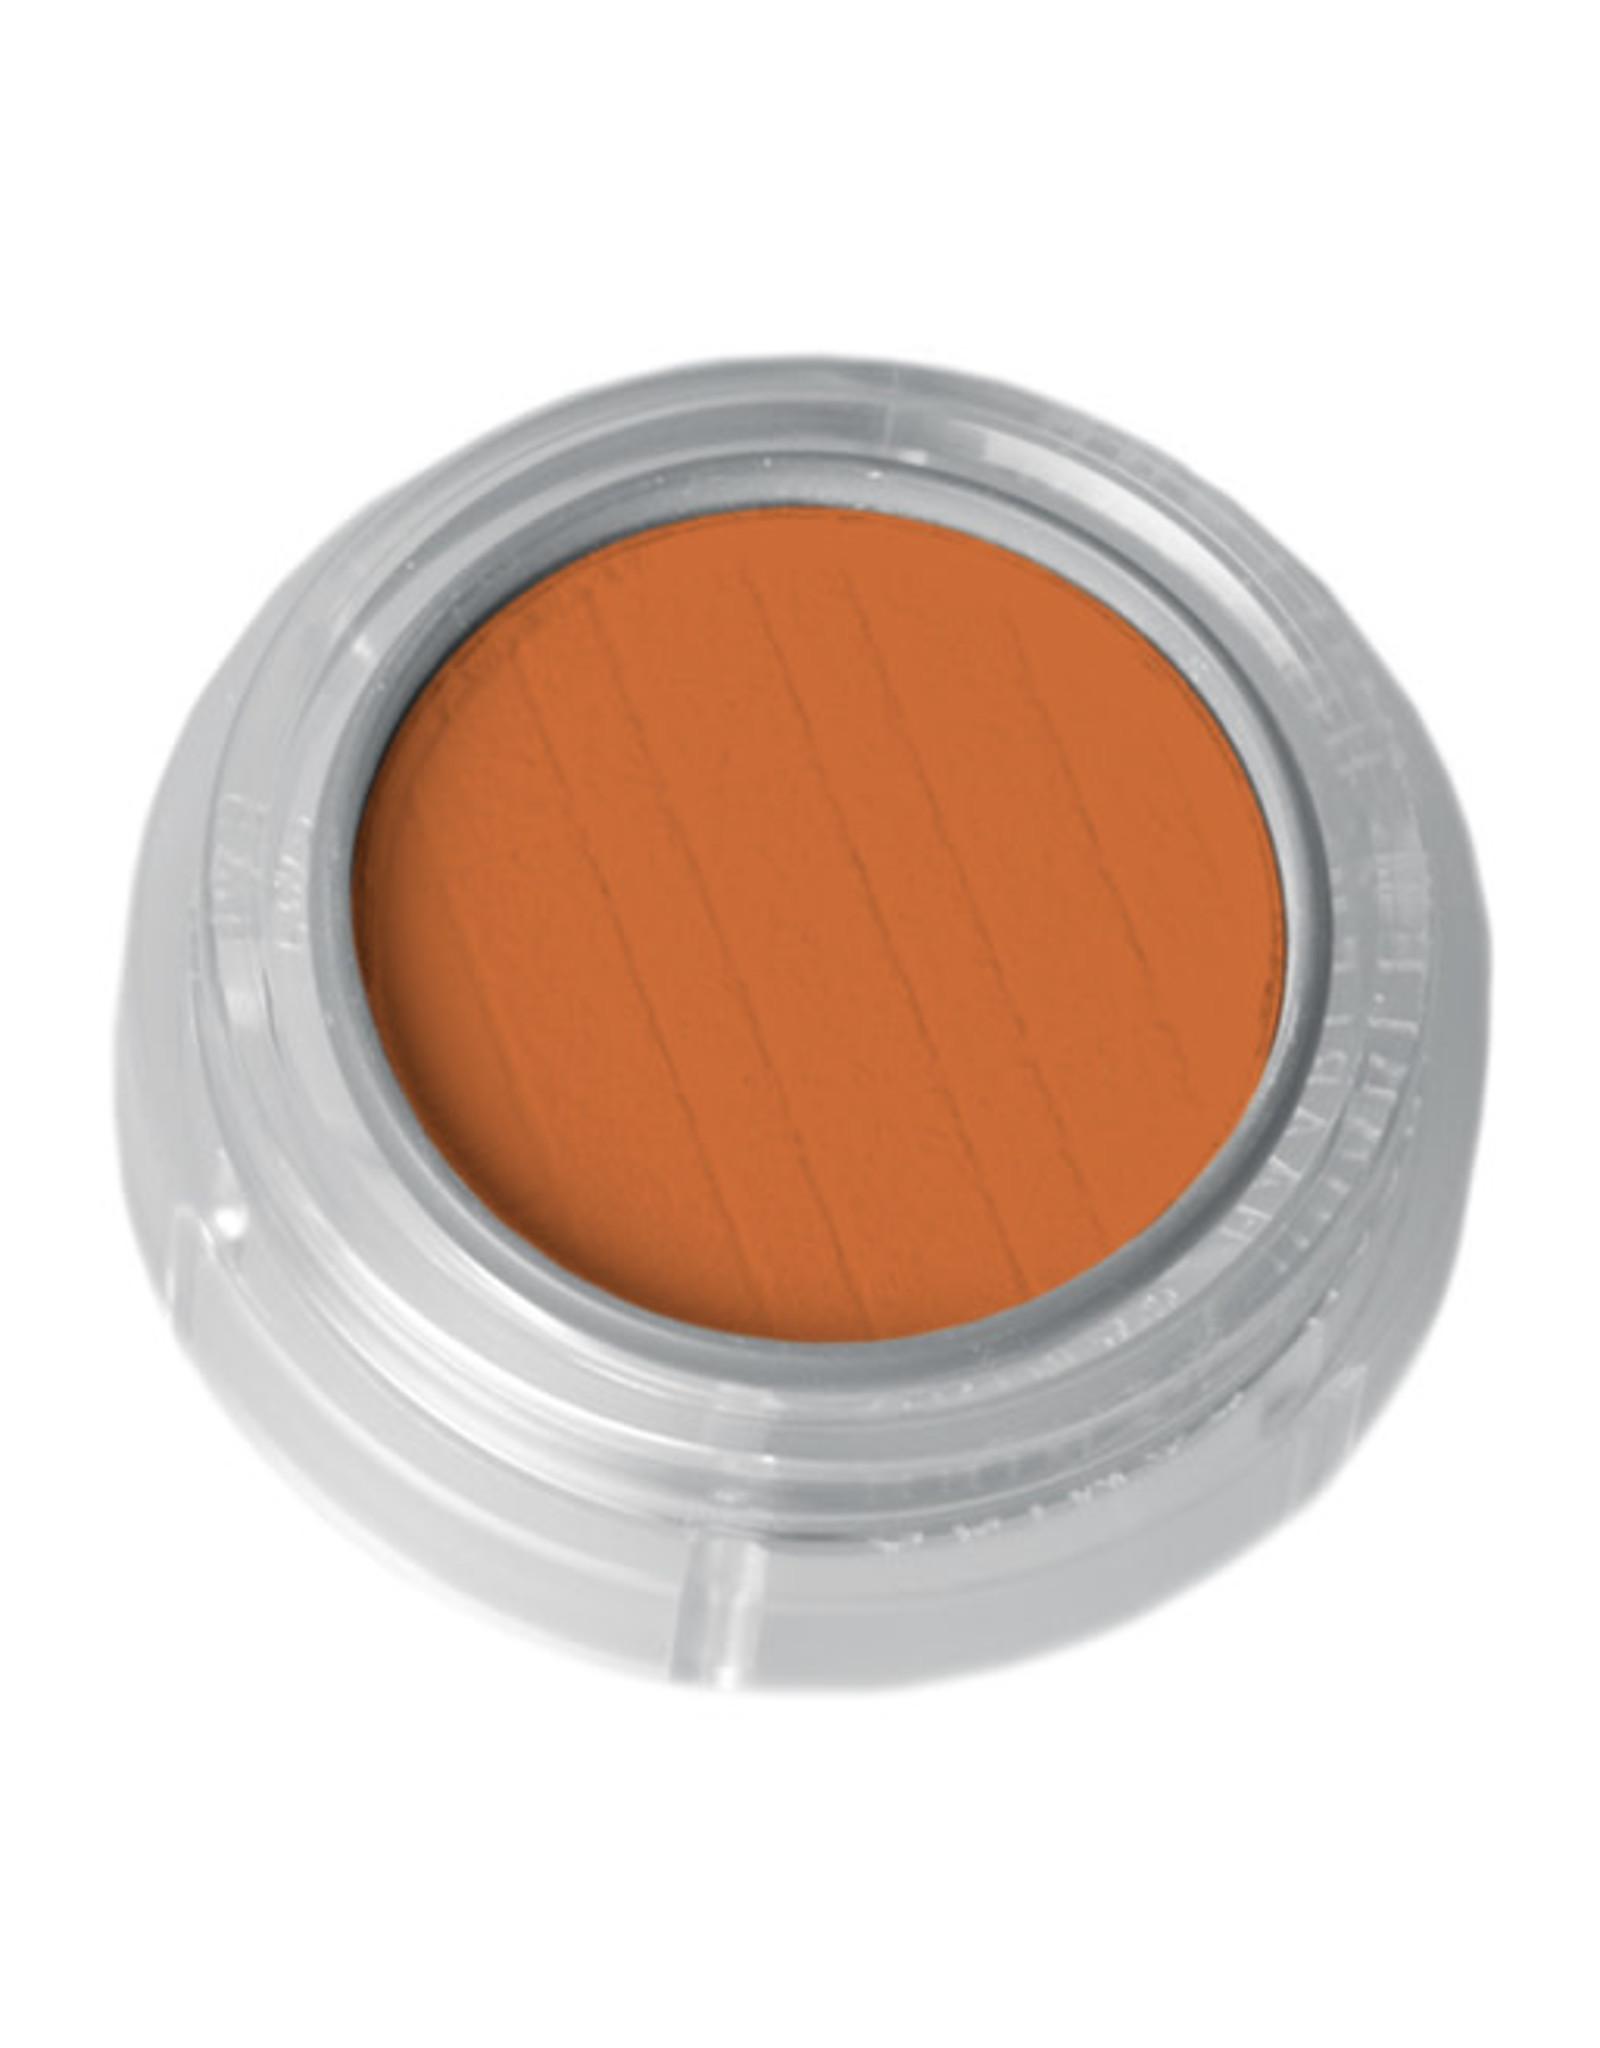 Grimas EYESHADOW/ROUGE 583 Oranje A1 (2 g)